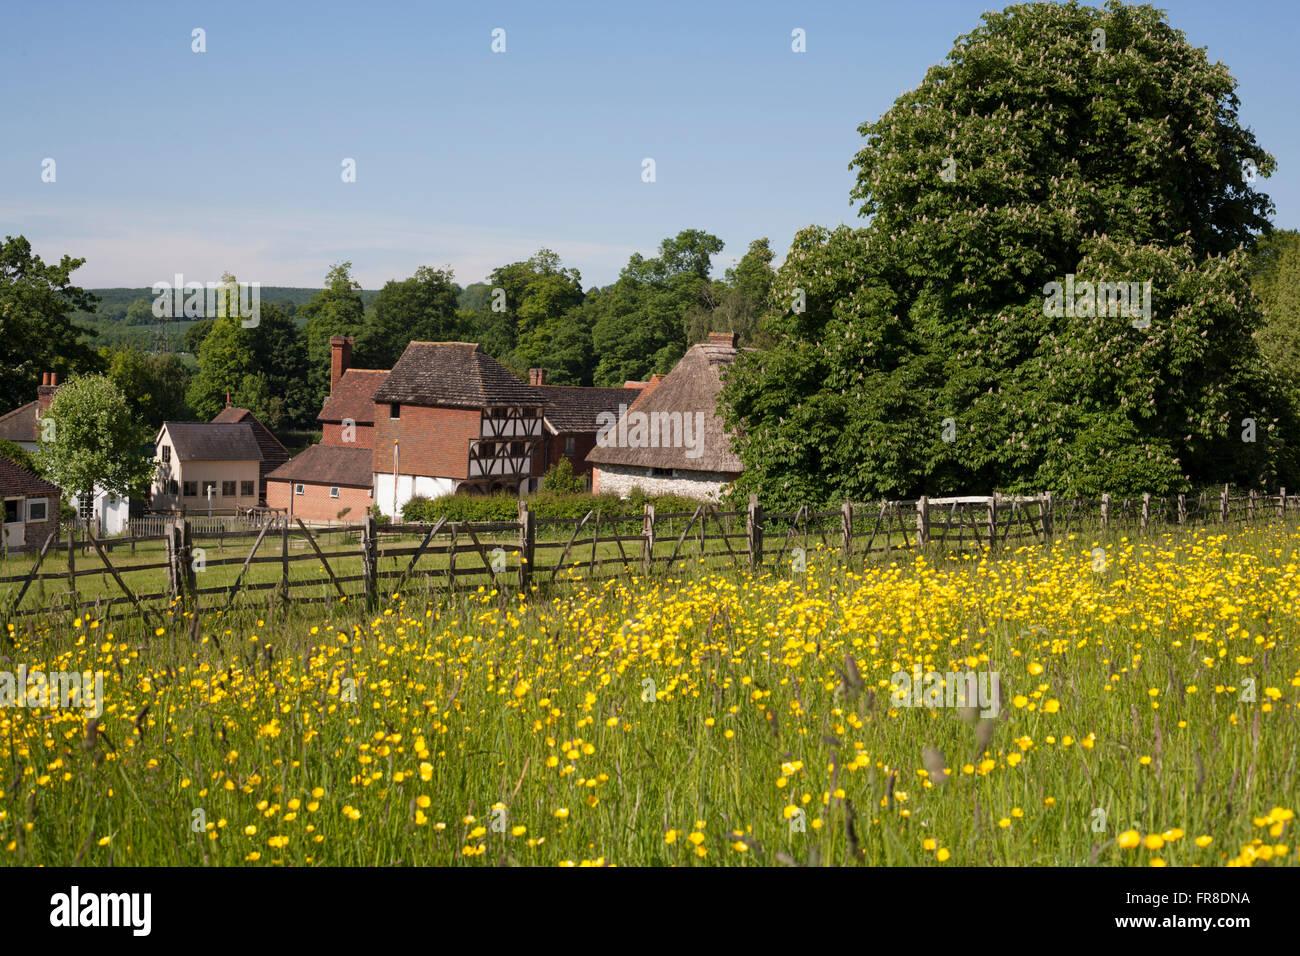 Weald & Downland Open Air Museum.Singleton,West Sussex , England. - Stock Image